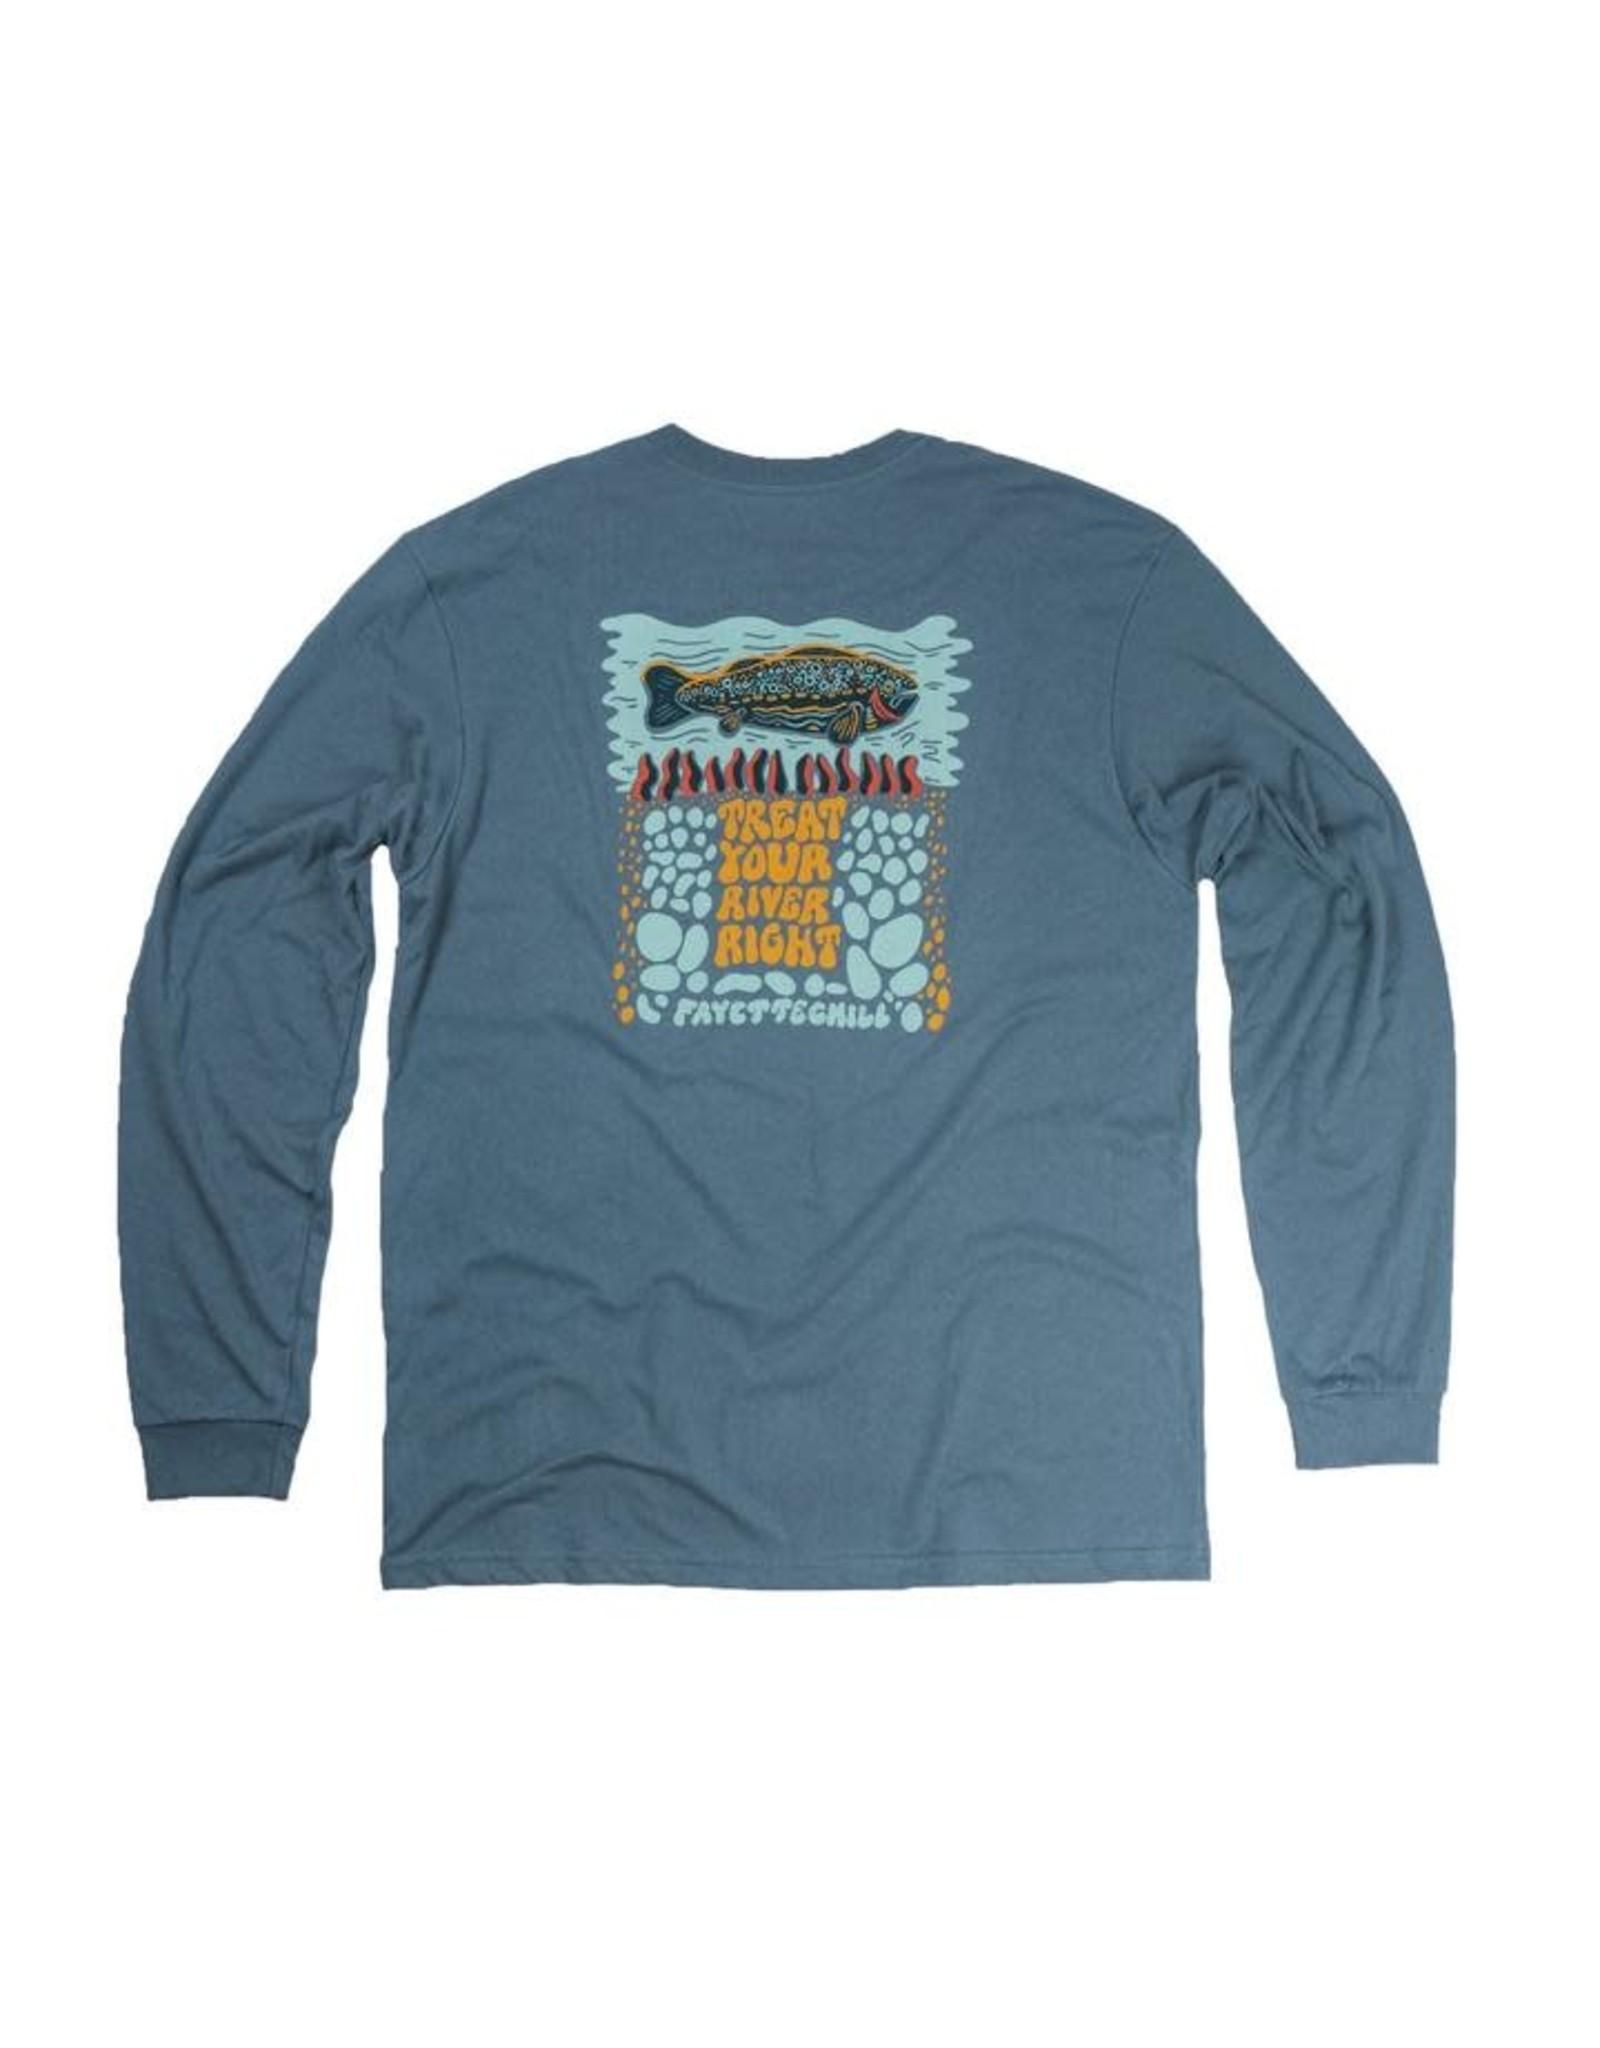 Fayettechill Fayettechill L/S Tyrr T-Shirt